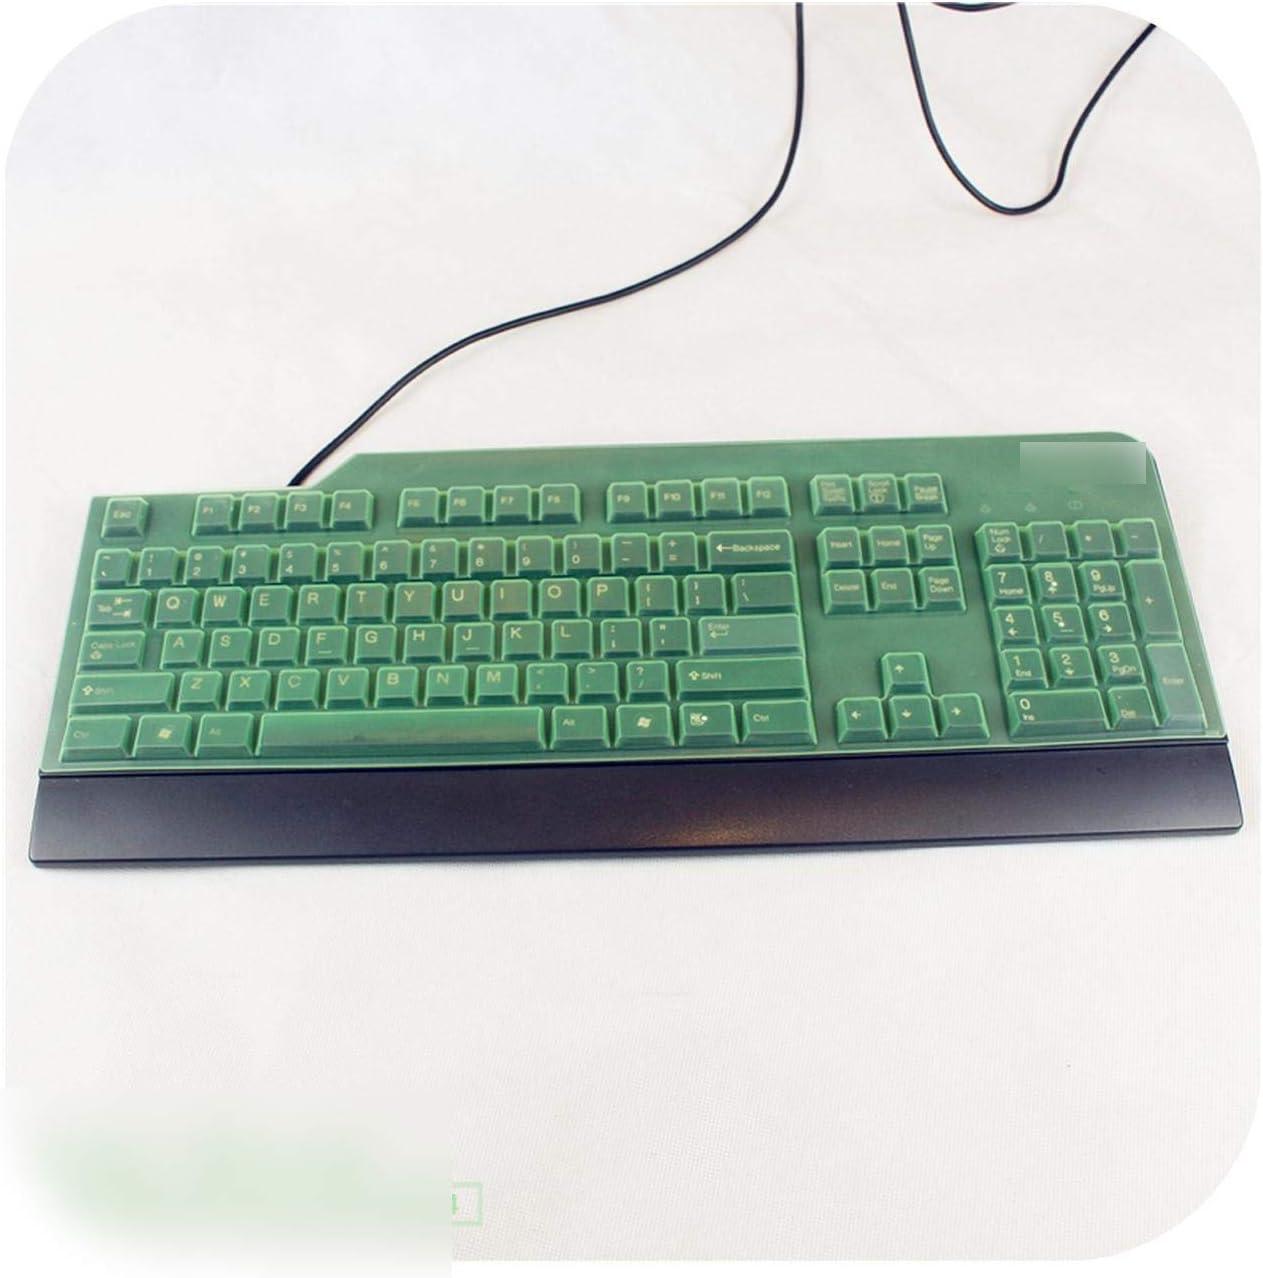 Desktop Computer All in One Pc Keyboard Cover Protector for Lenovo Sk 8813 Ku 0225 8820 8825 Ku0225 Kb1021 Ekb 425A Kb 1021-Green